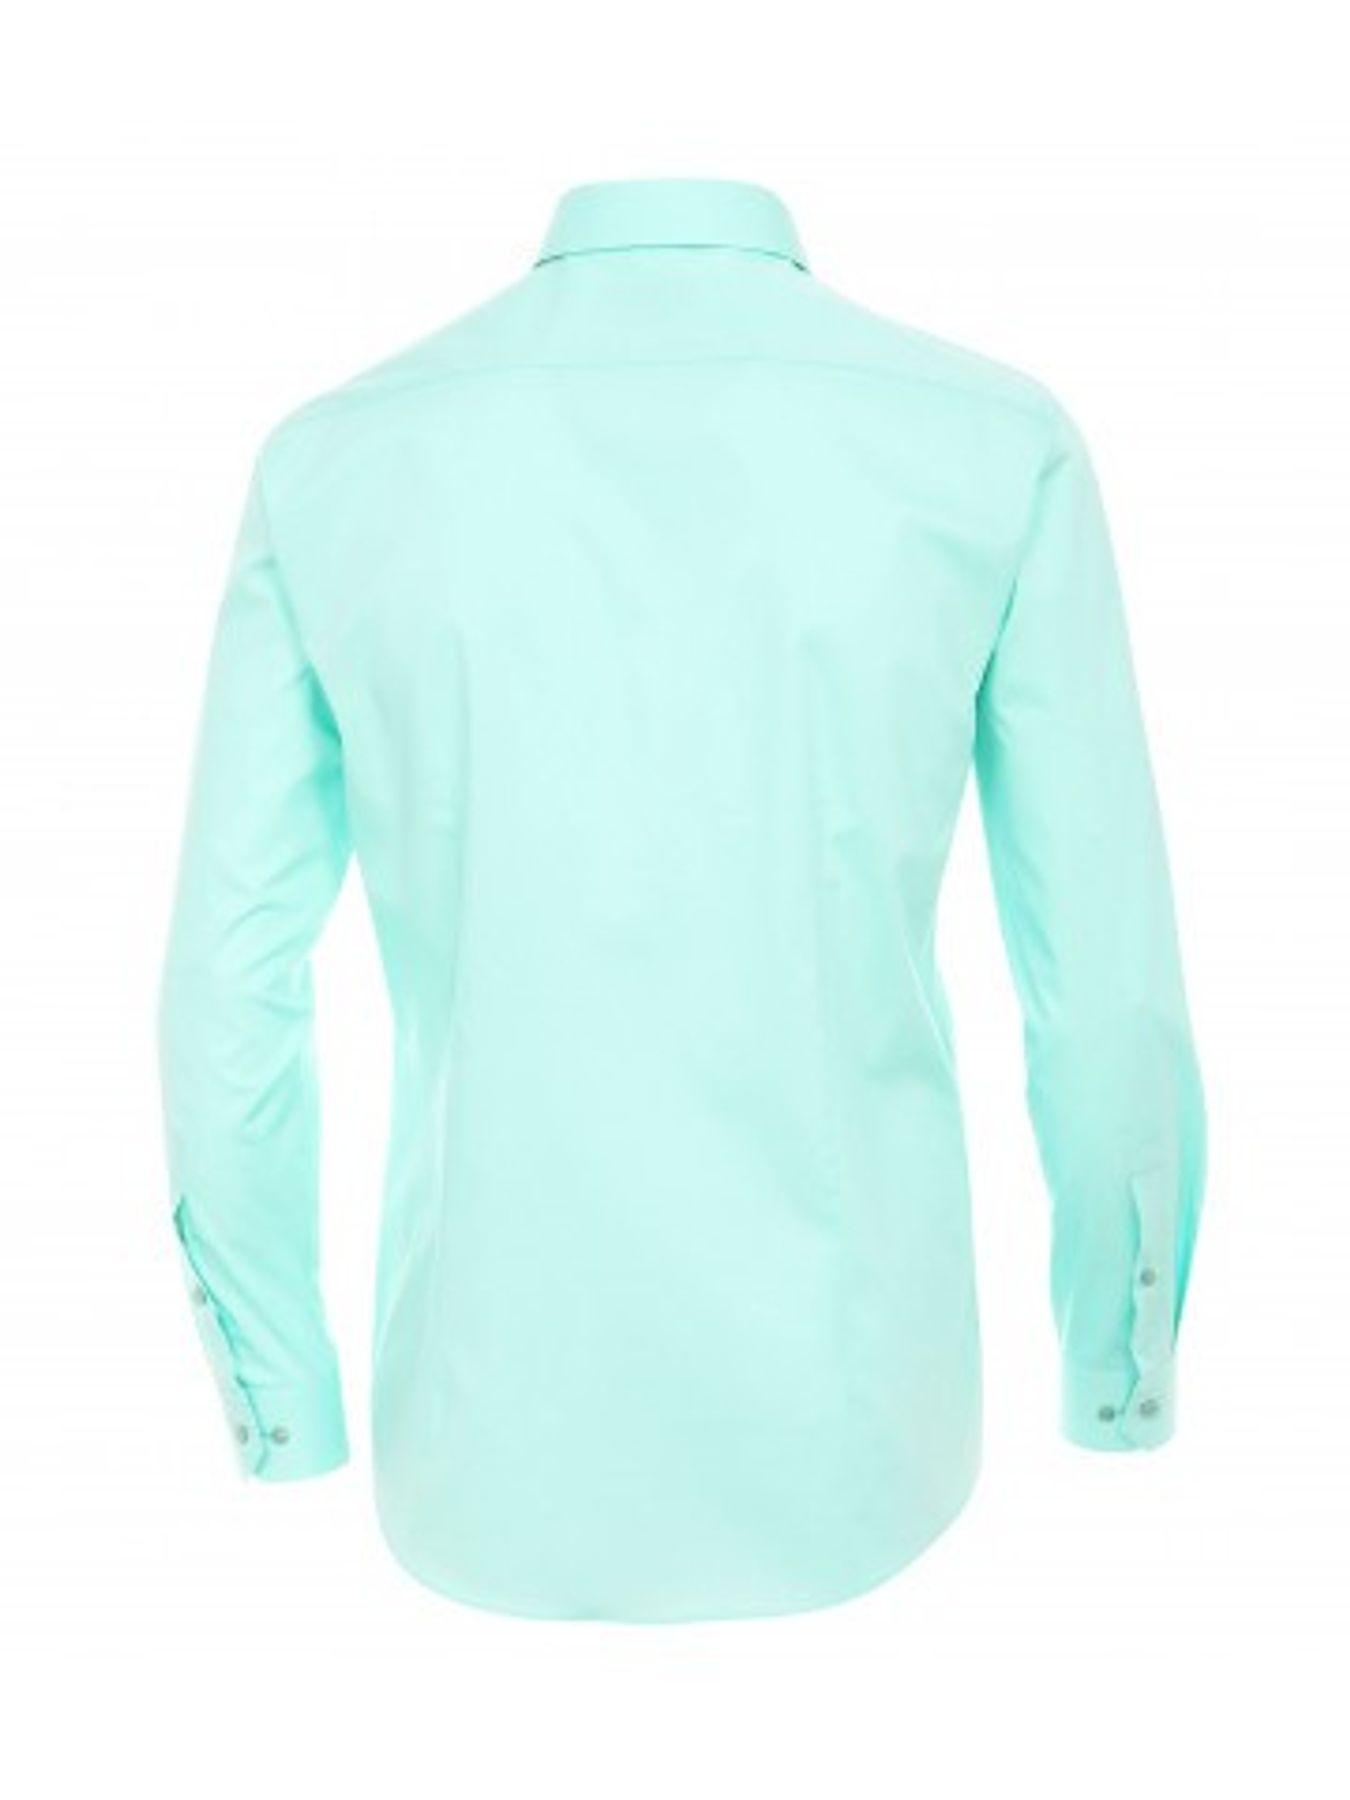 Venti - Body Fit/Super Slim Fit - Bügelfreies Herren Langarm Hemd in diversen Farben (001470) – Bild 24